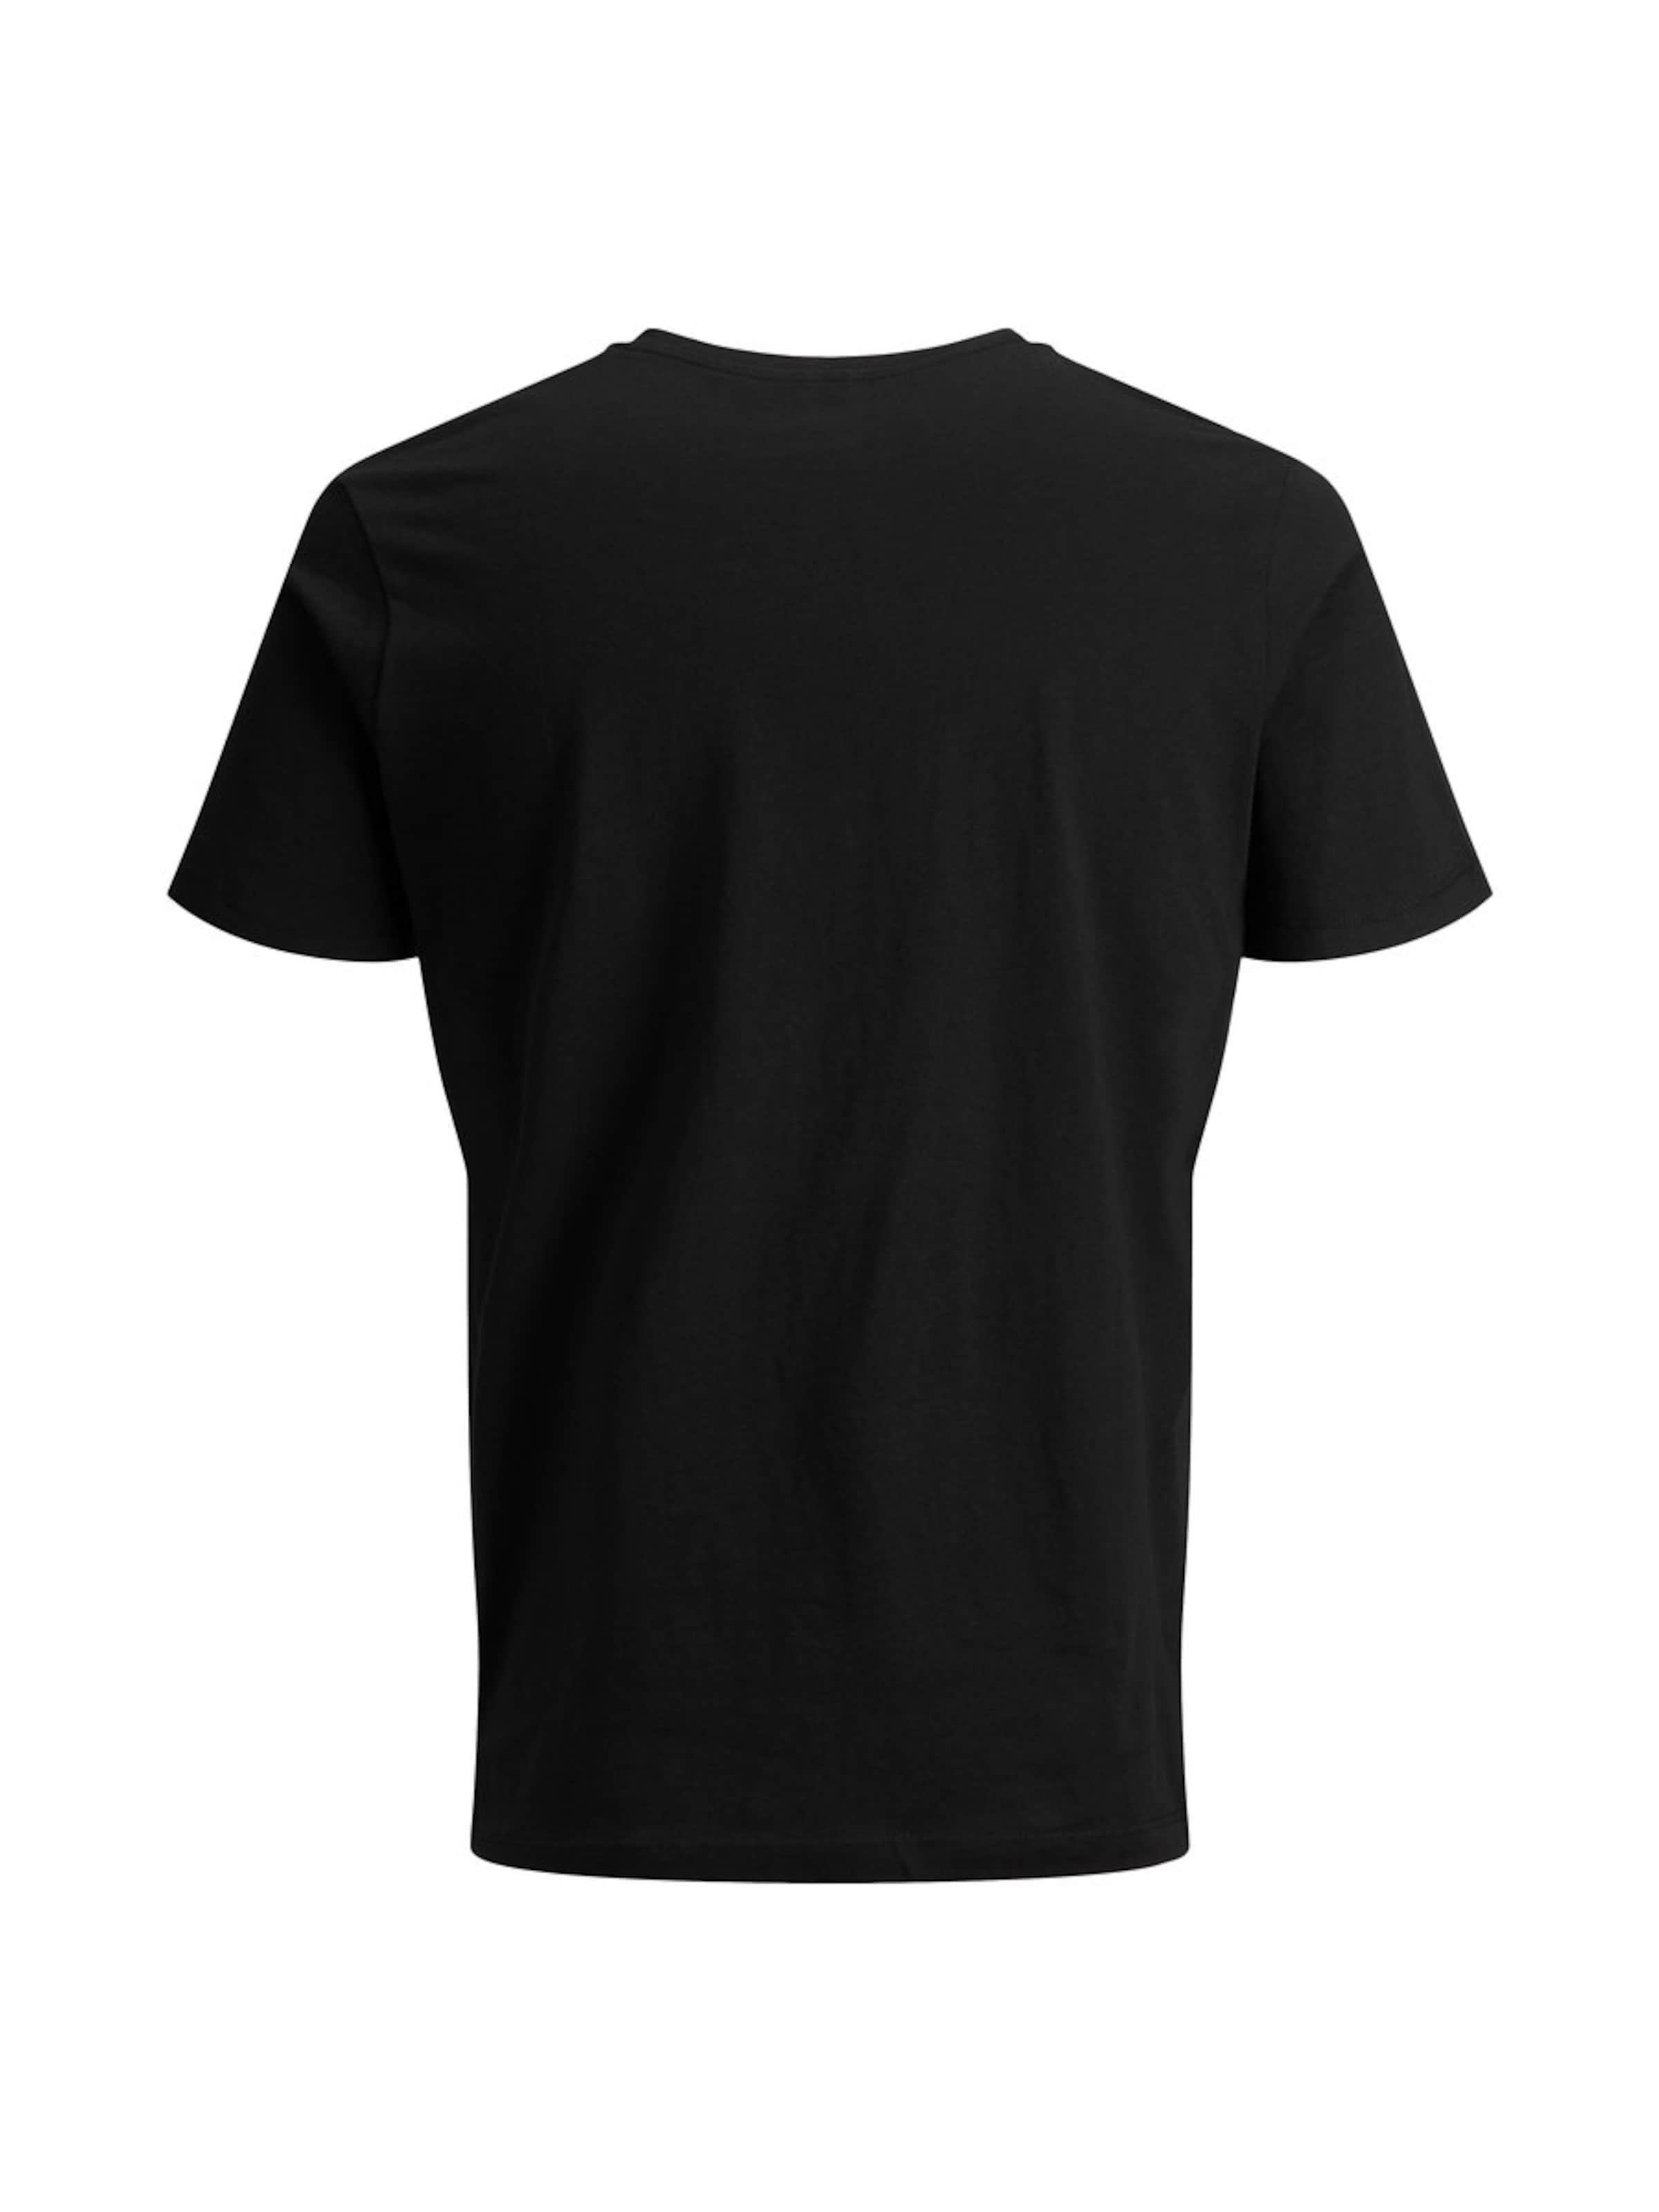 shirt Weiß T Jackamp; Jones In BlauSchwarz hdsQtCr